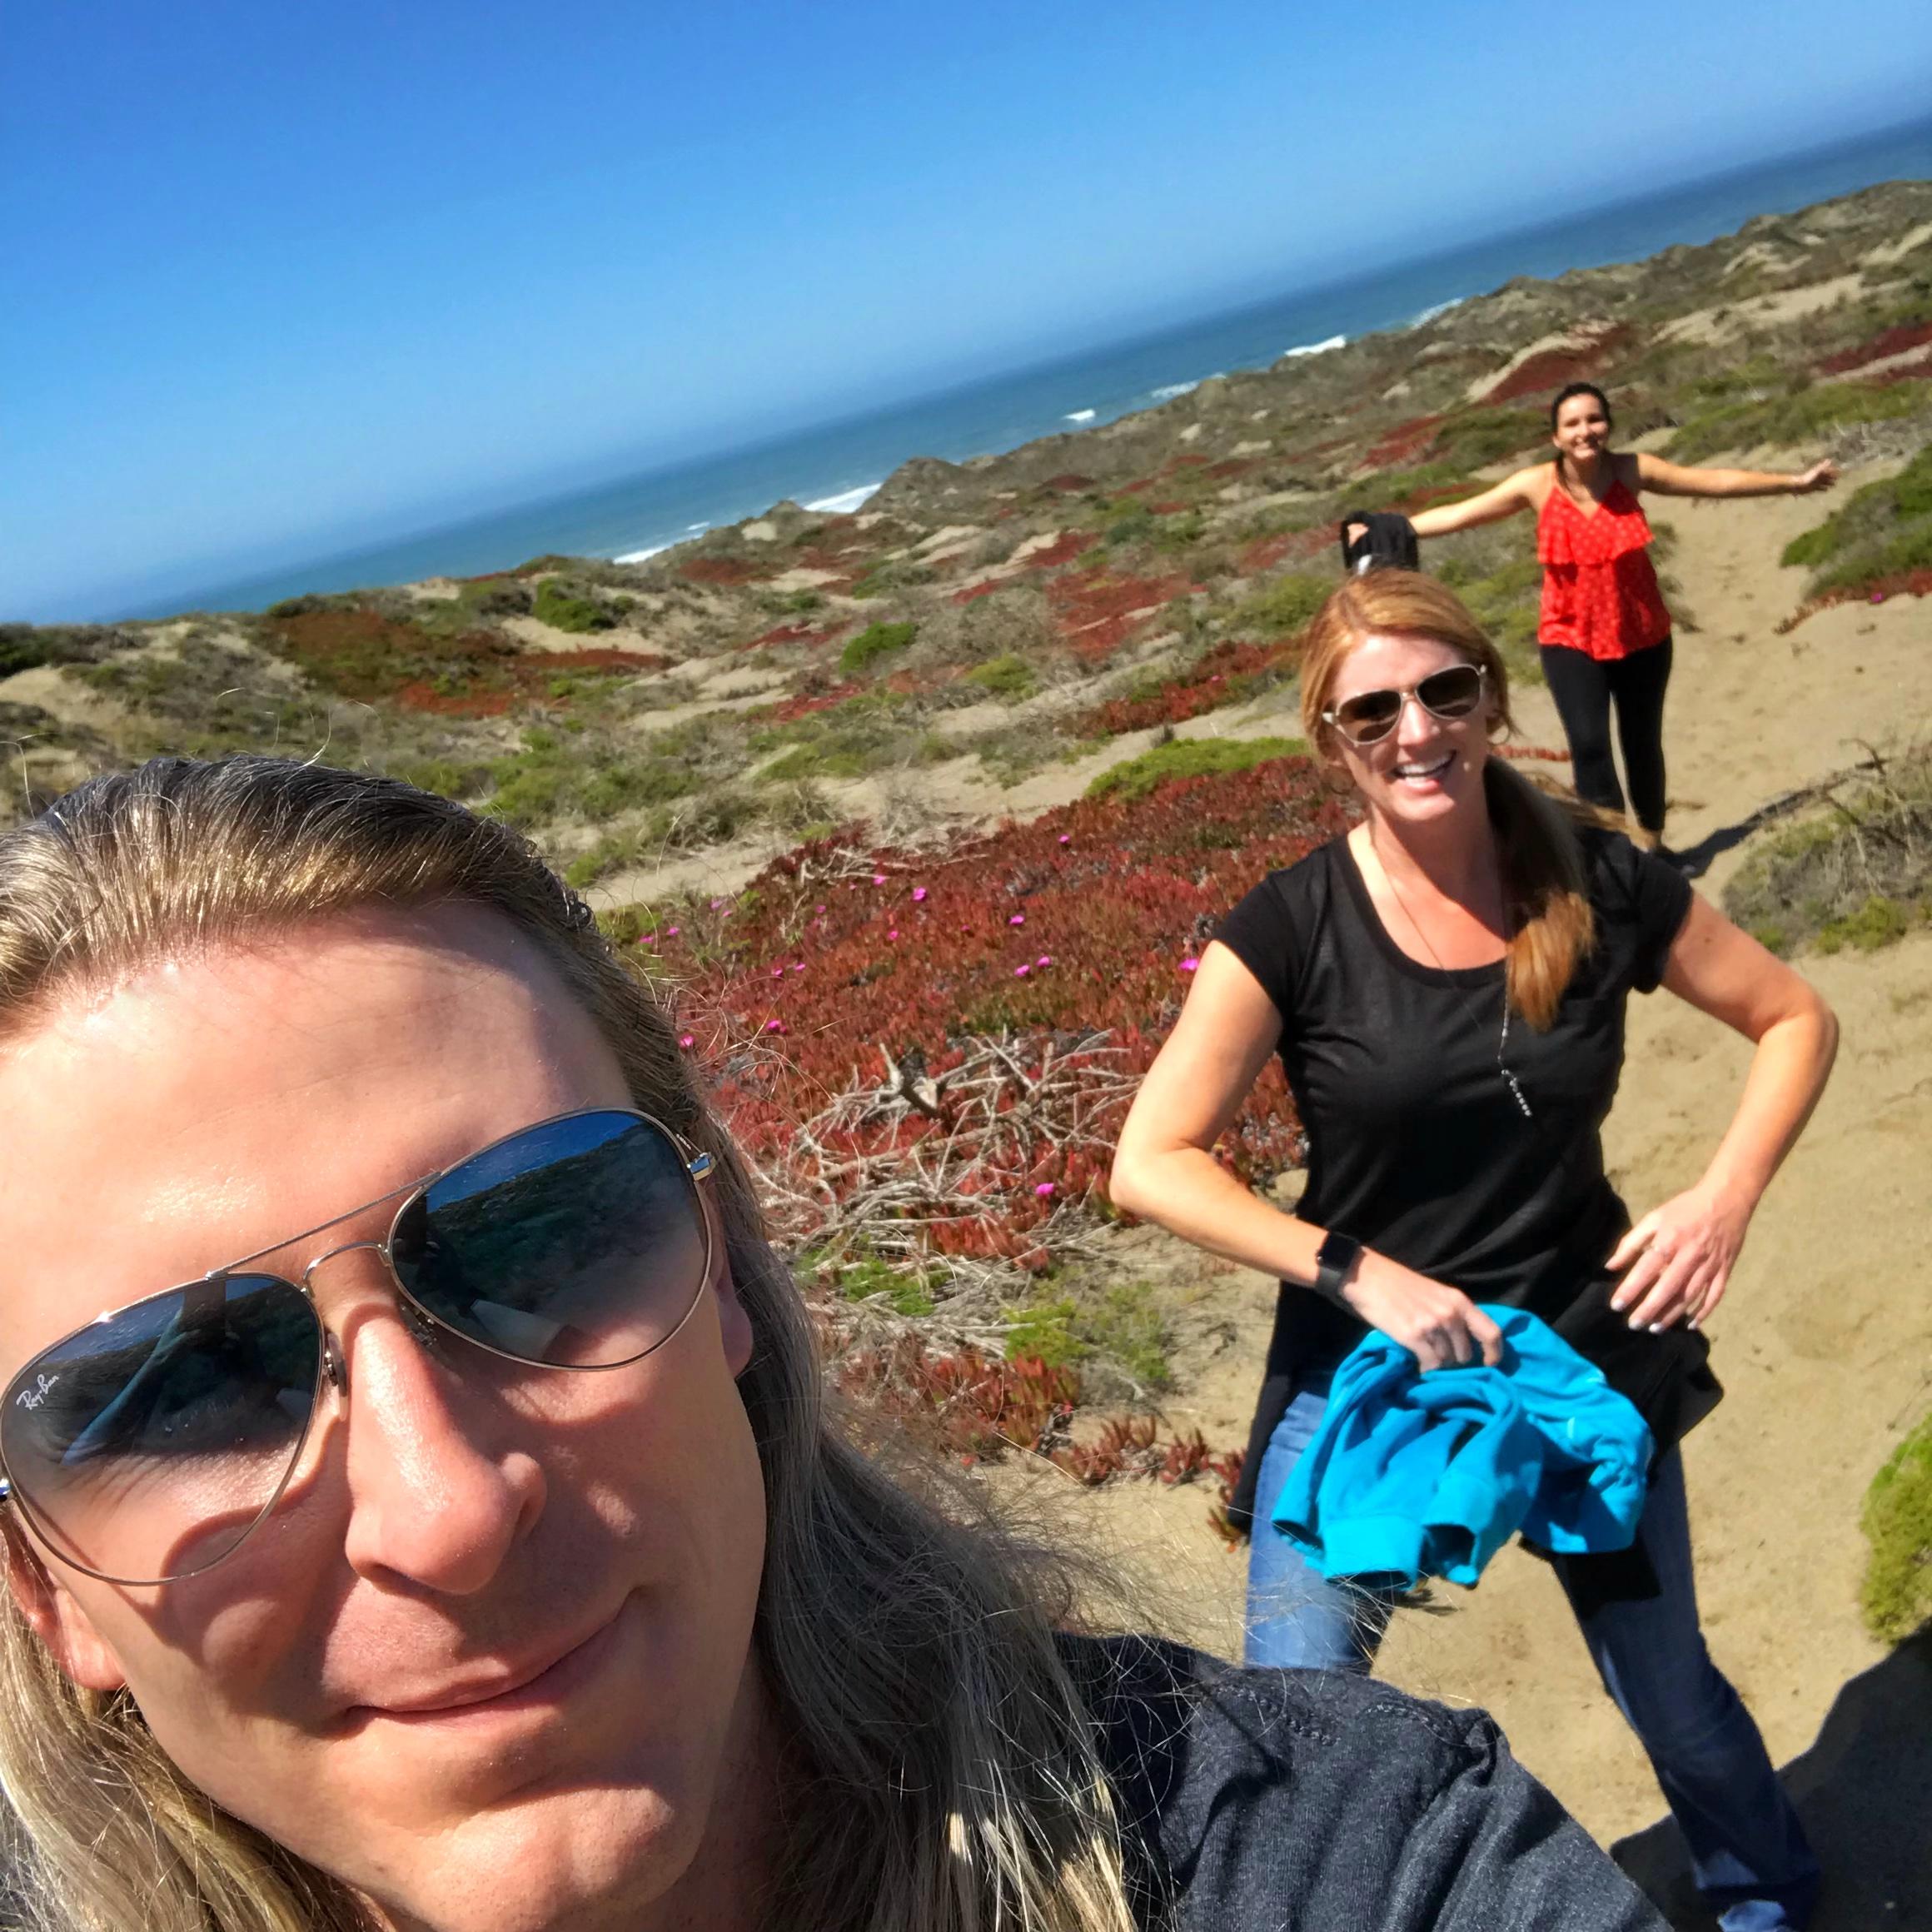 Bodega Bay dunes